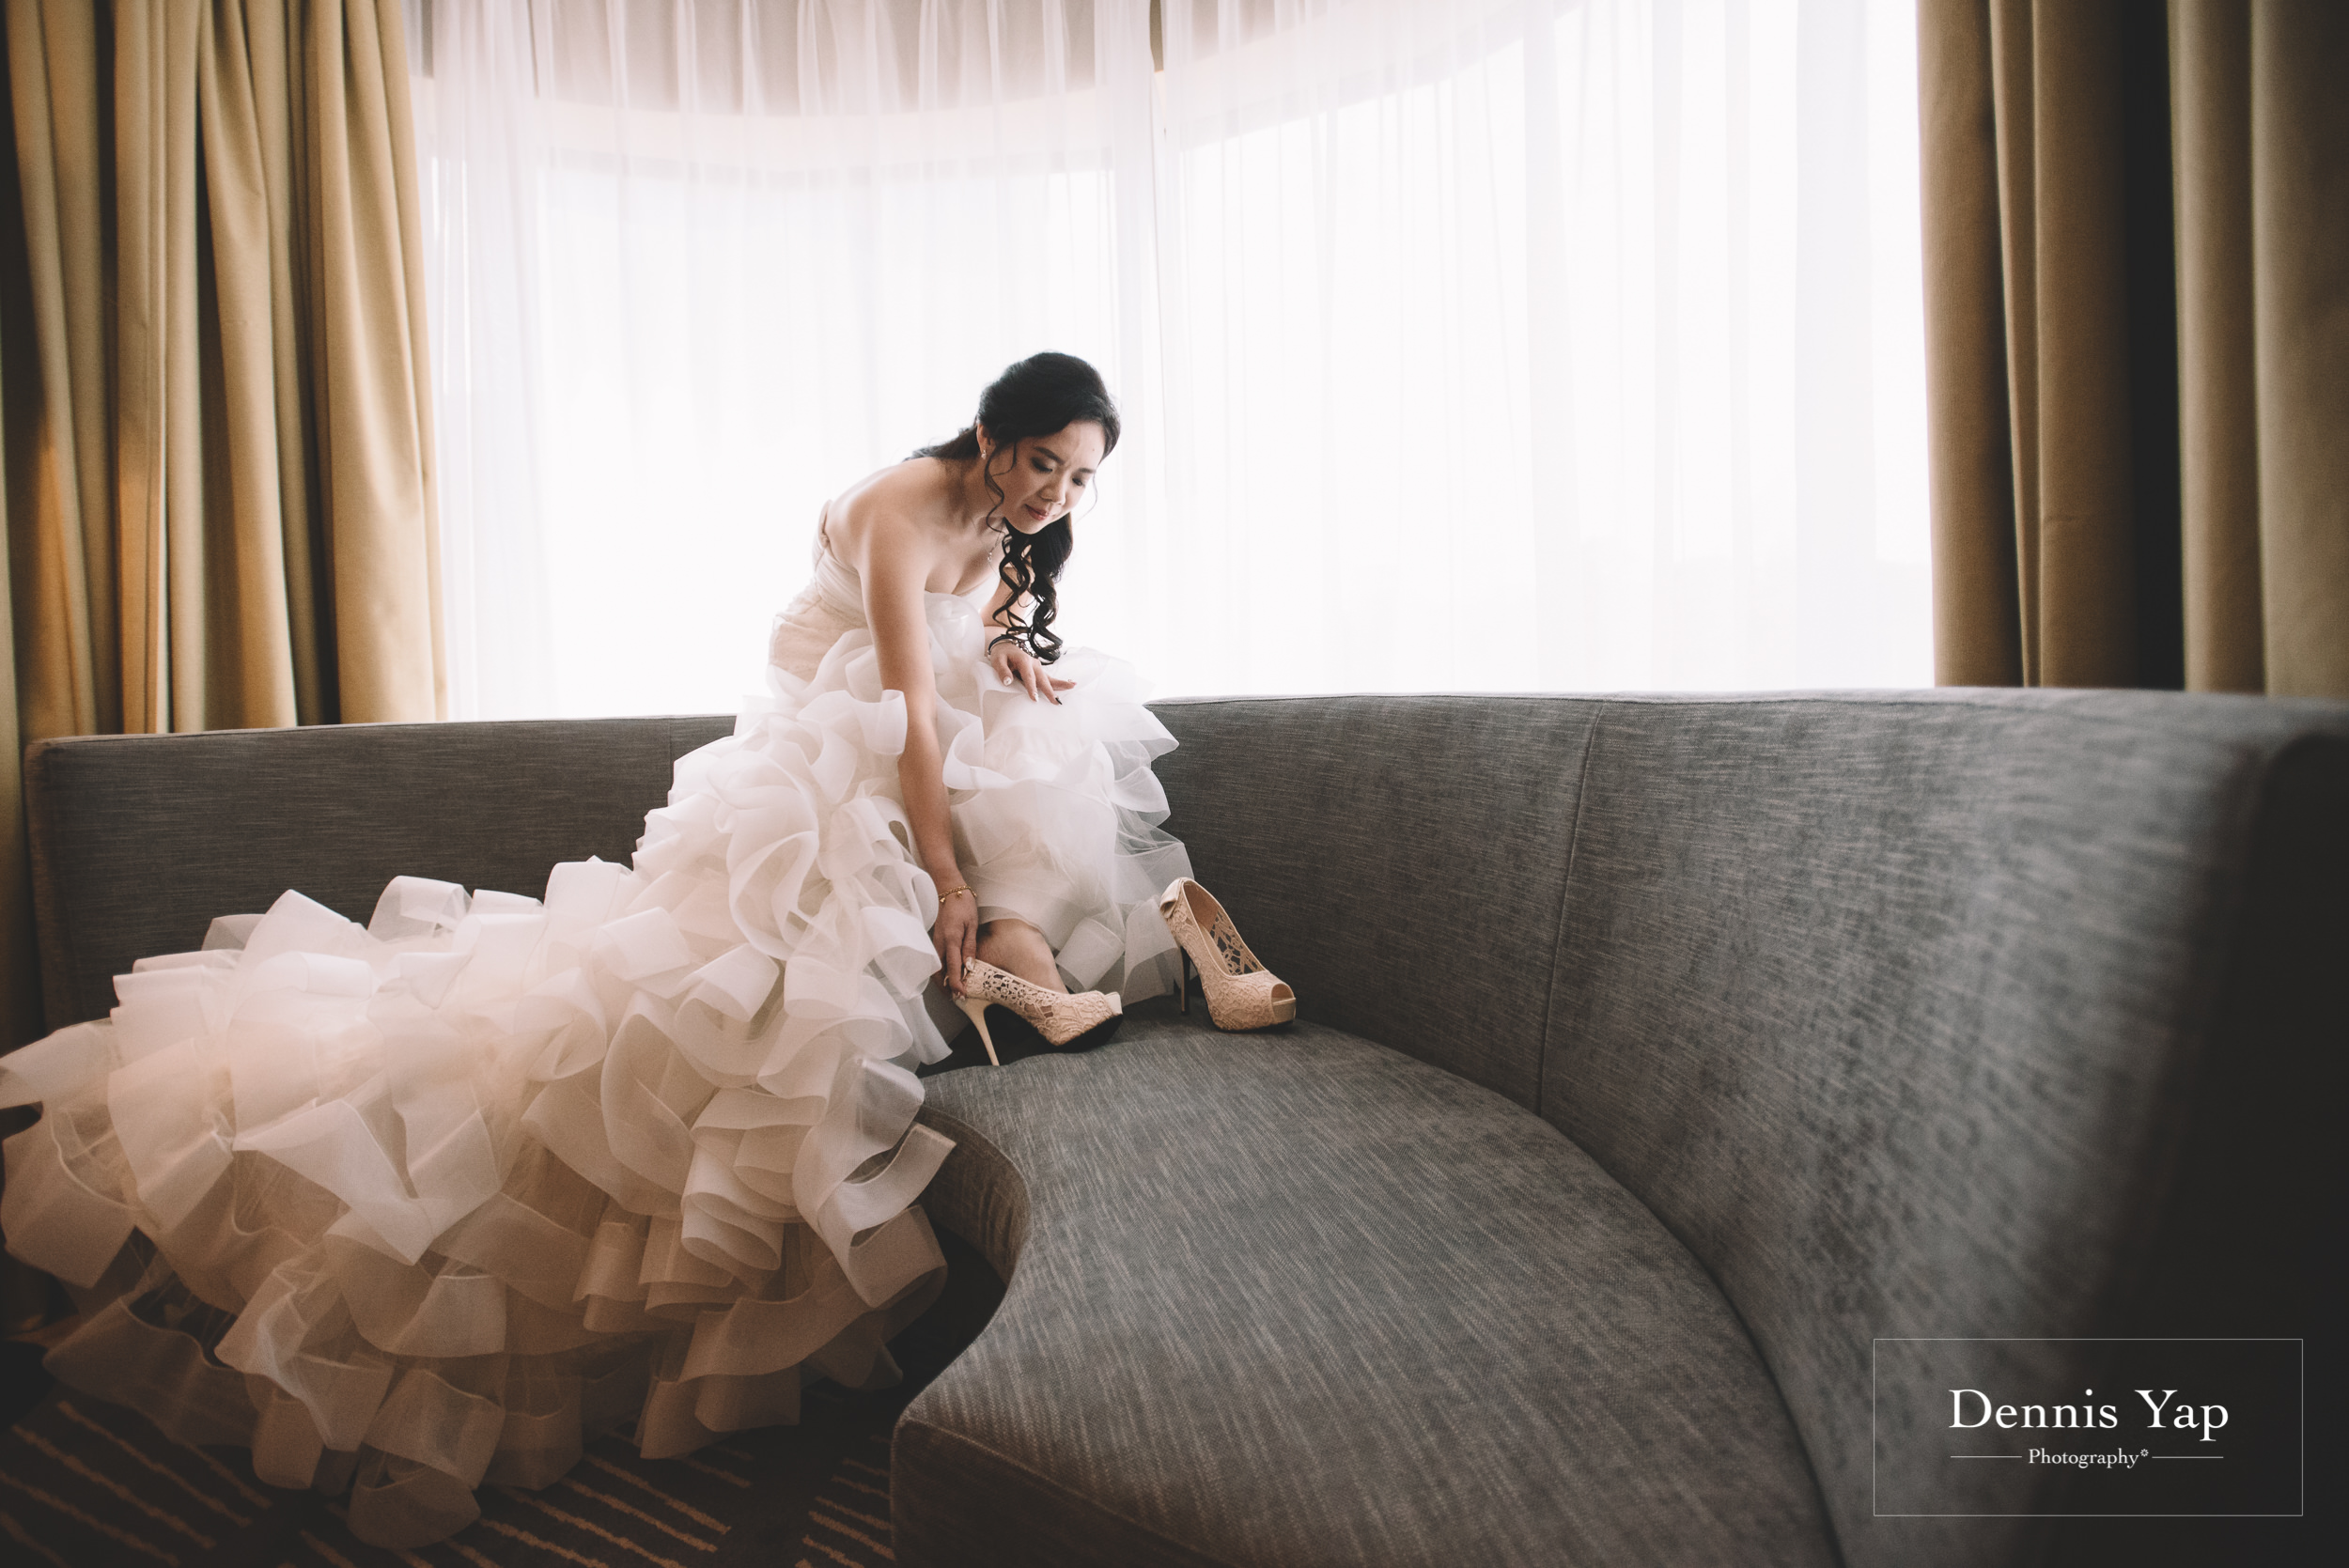 vincent peggy wedding dinner neo tamarind kuala lumpur dennis yap photography-2.jpg